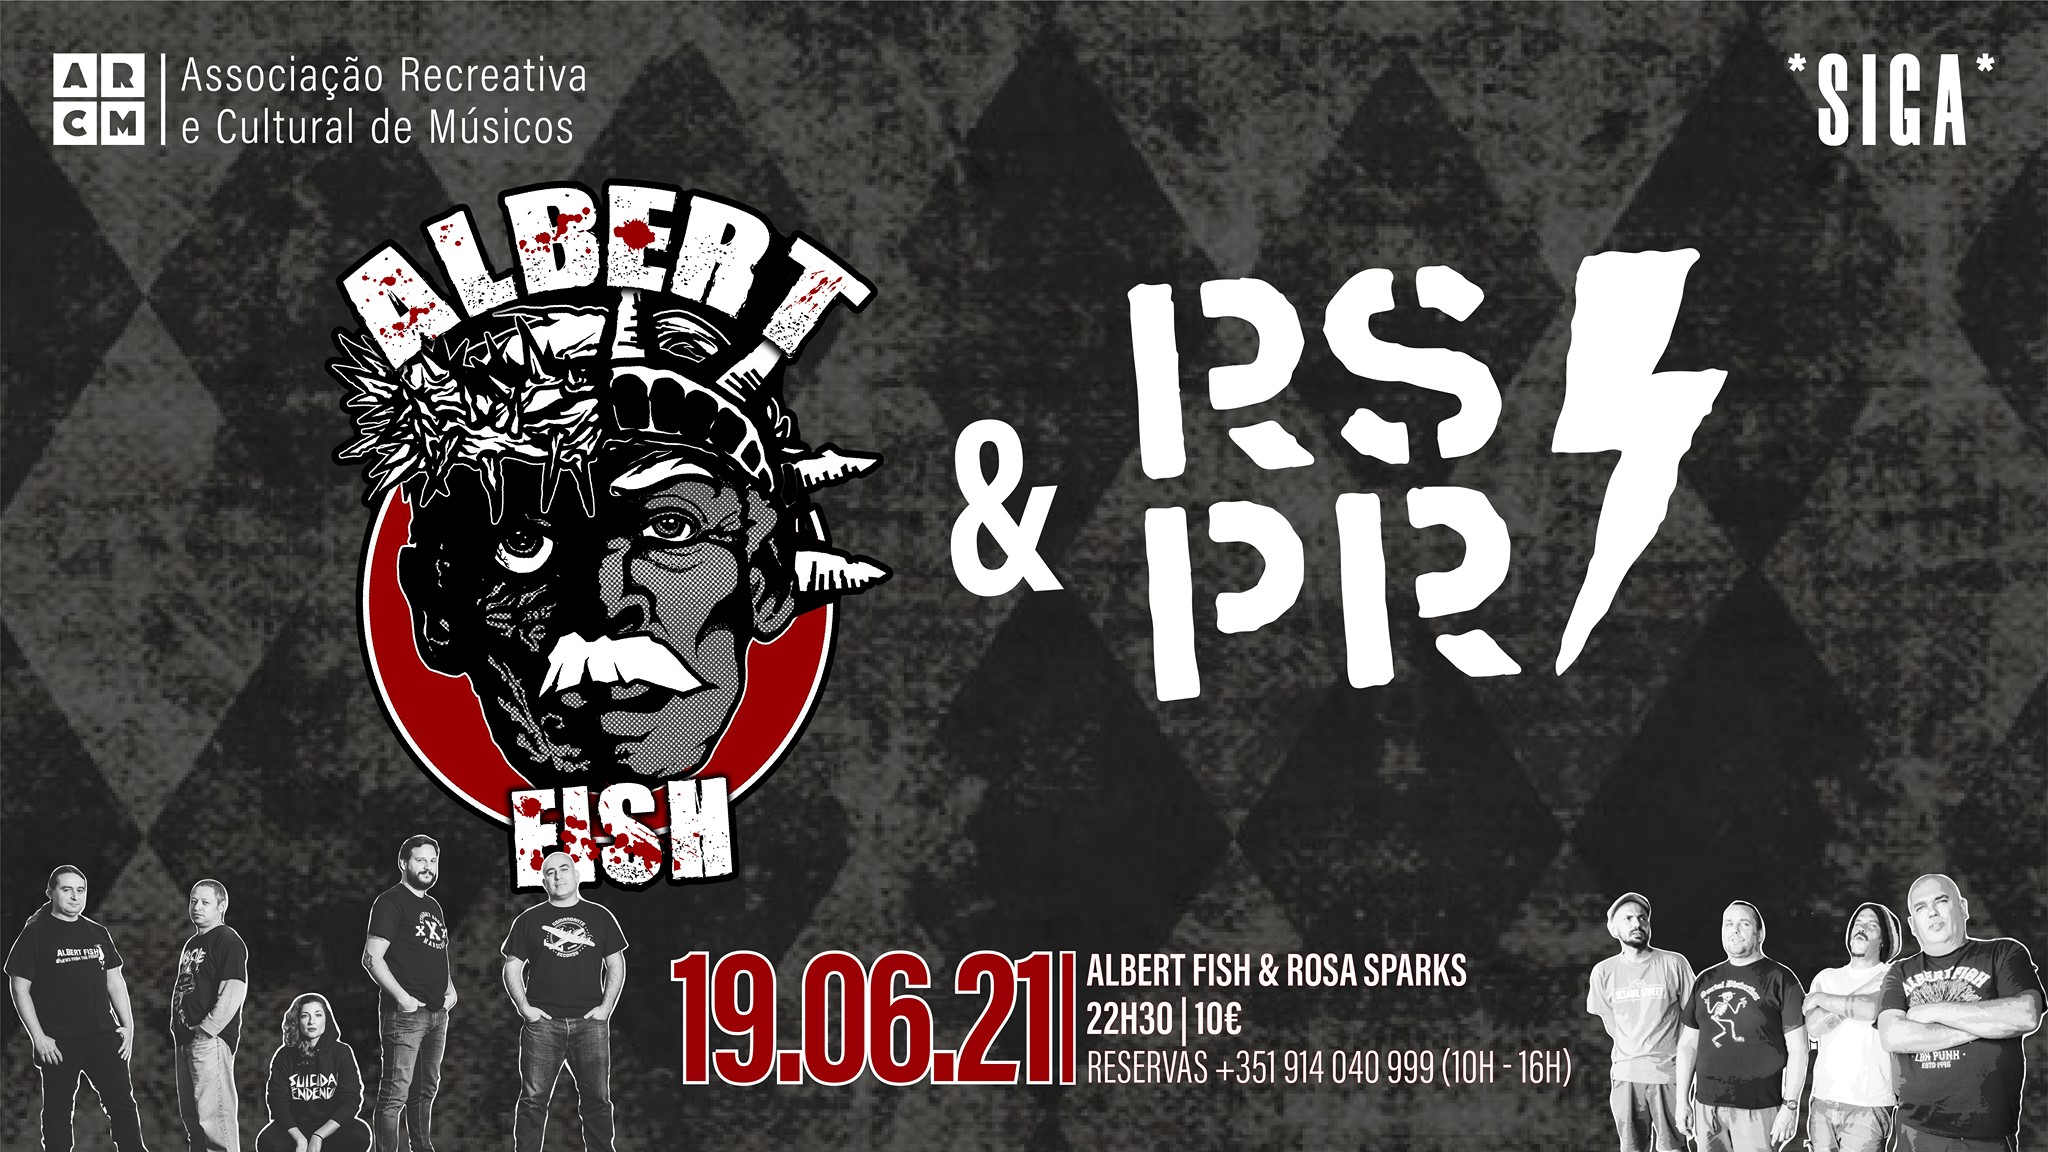 ALBERT FISH & ROSA SPARKS | *SIGA*